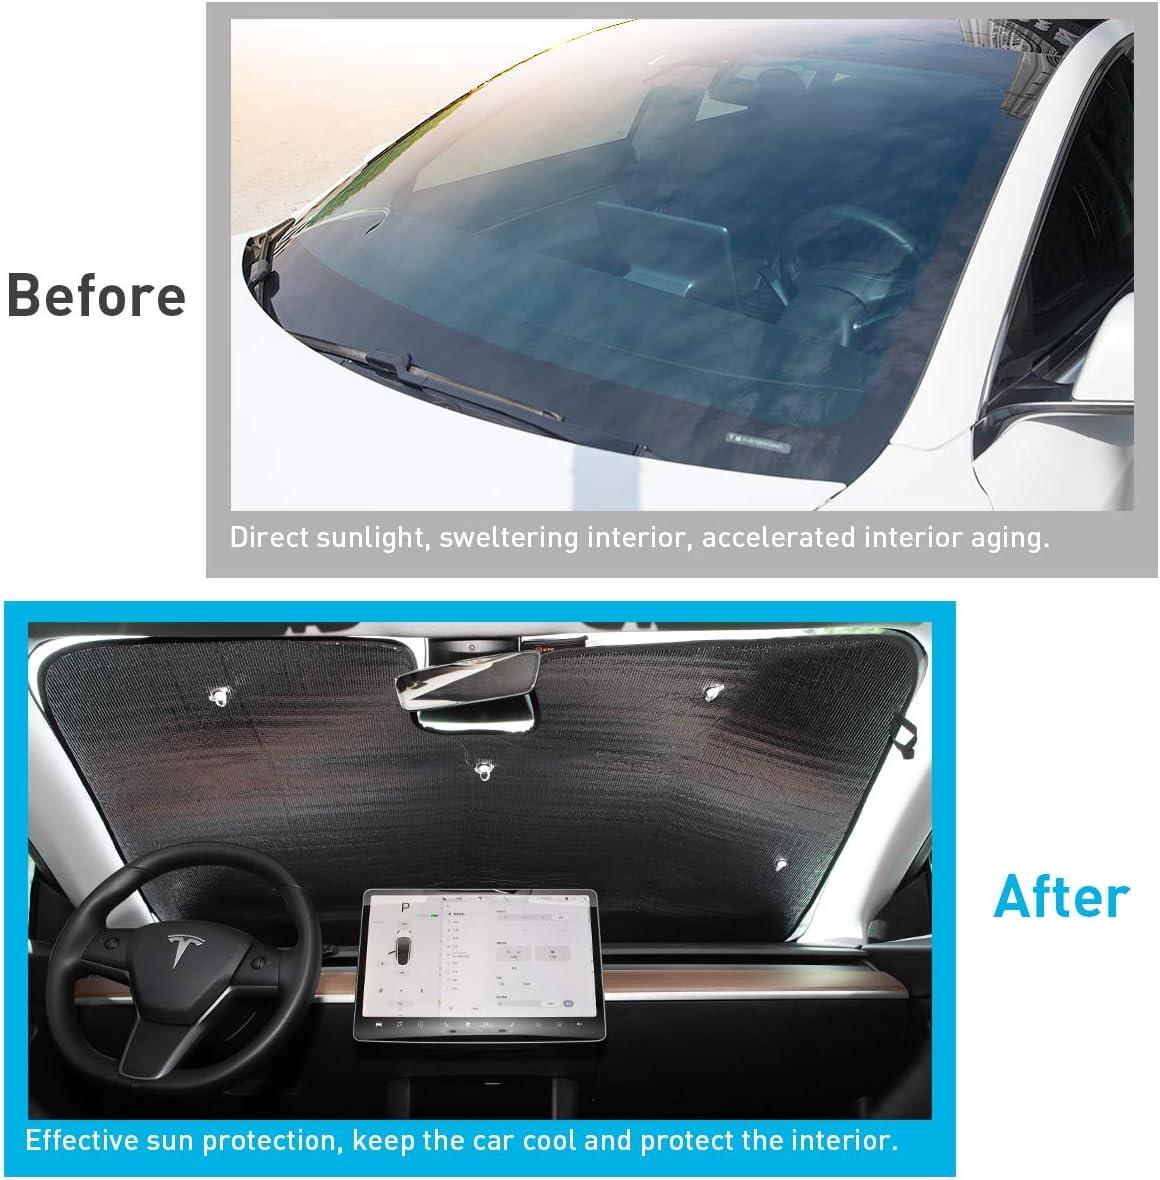 UV and Sun Protection Silver KFZMAN Dual-Sided Windowshield Sunshade for Tesla Model 3 2018-2020 Custom Fit Model 3 Sun Shade Front Windowshield